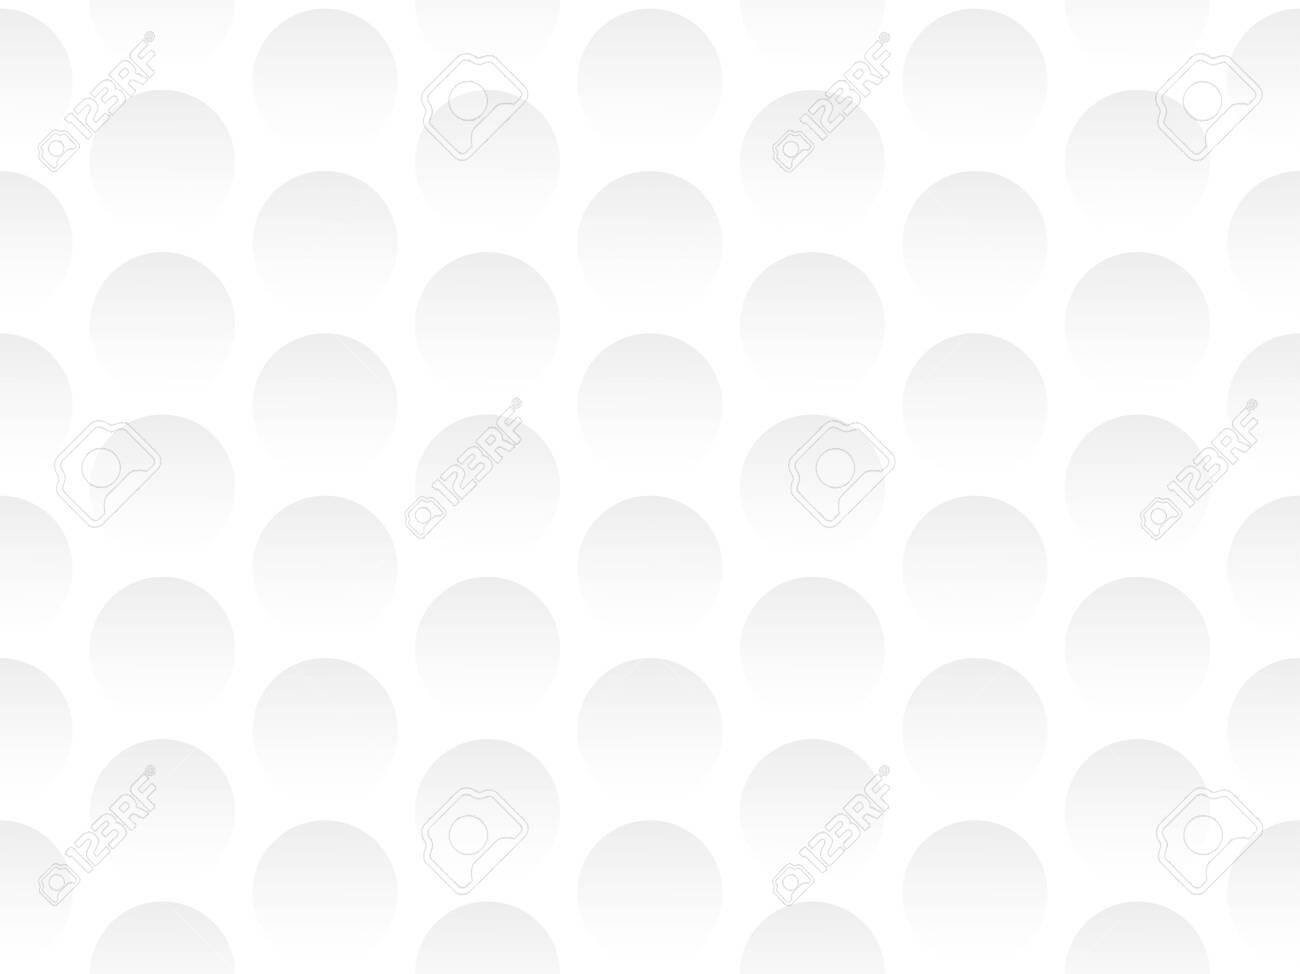 Vector seamless texture with 3d balls - 124115217